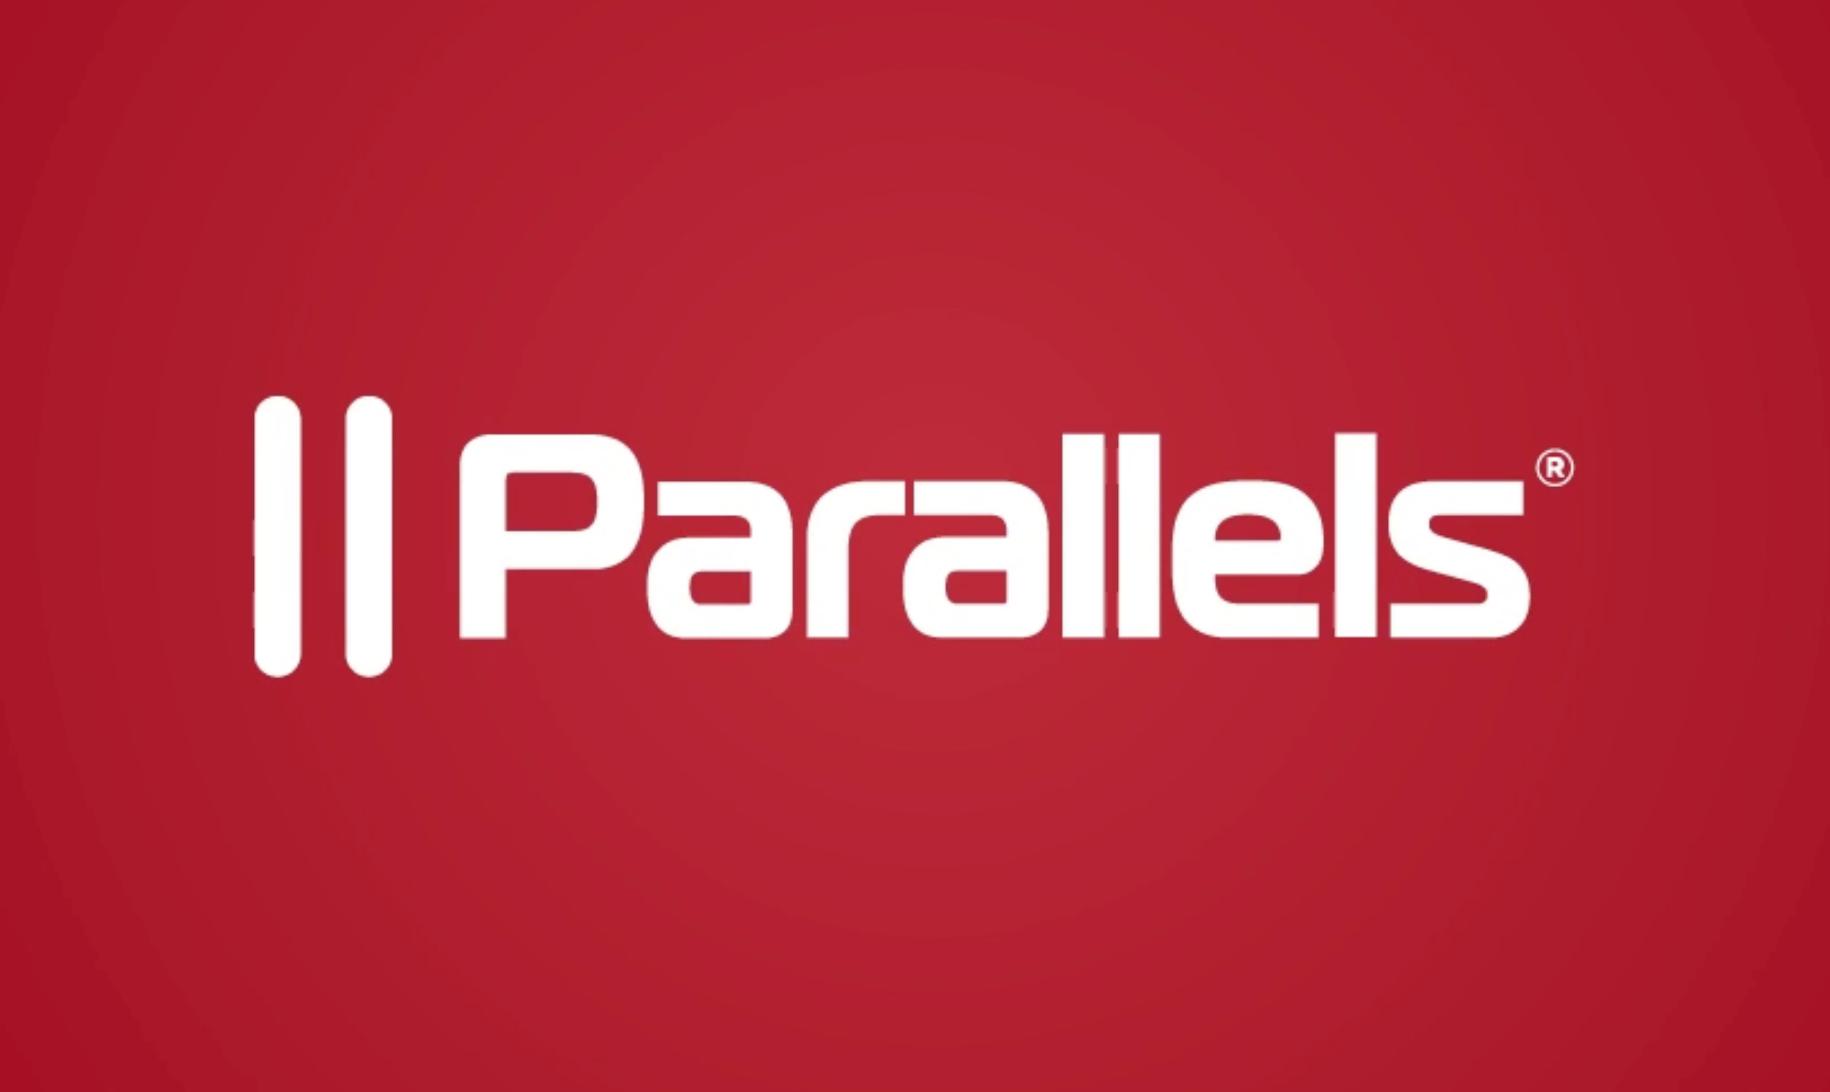 Parallels Desktop 12 출시, macOS Sierra 지원